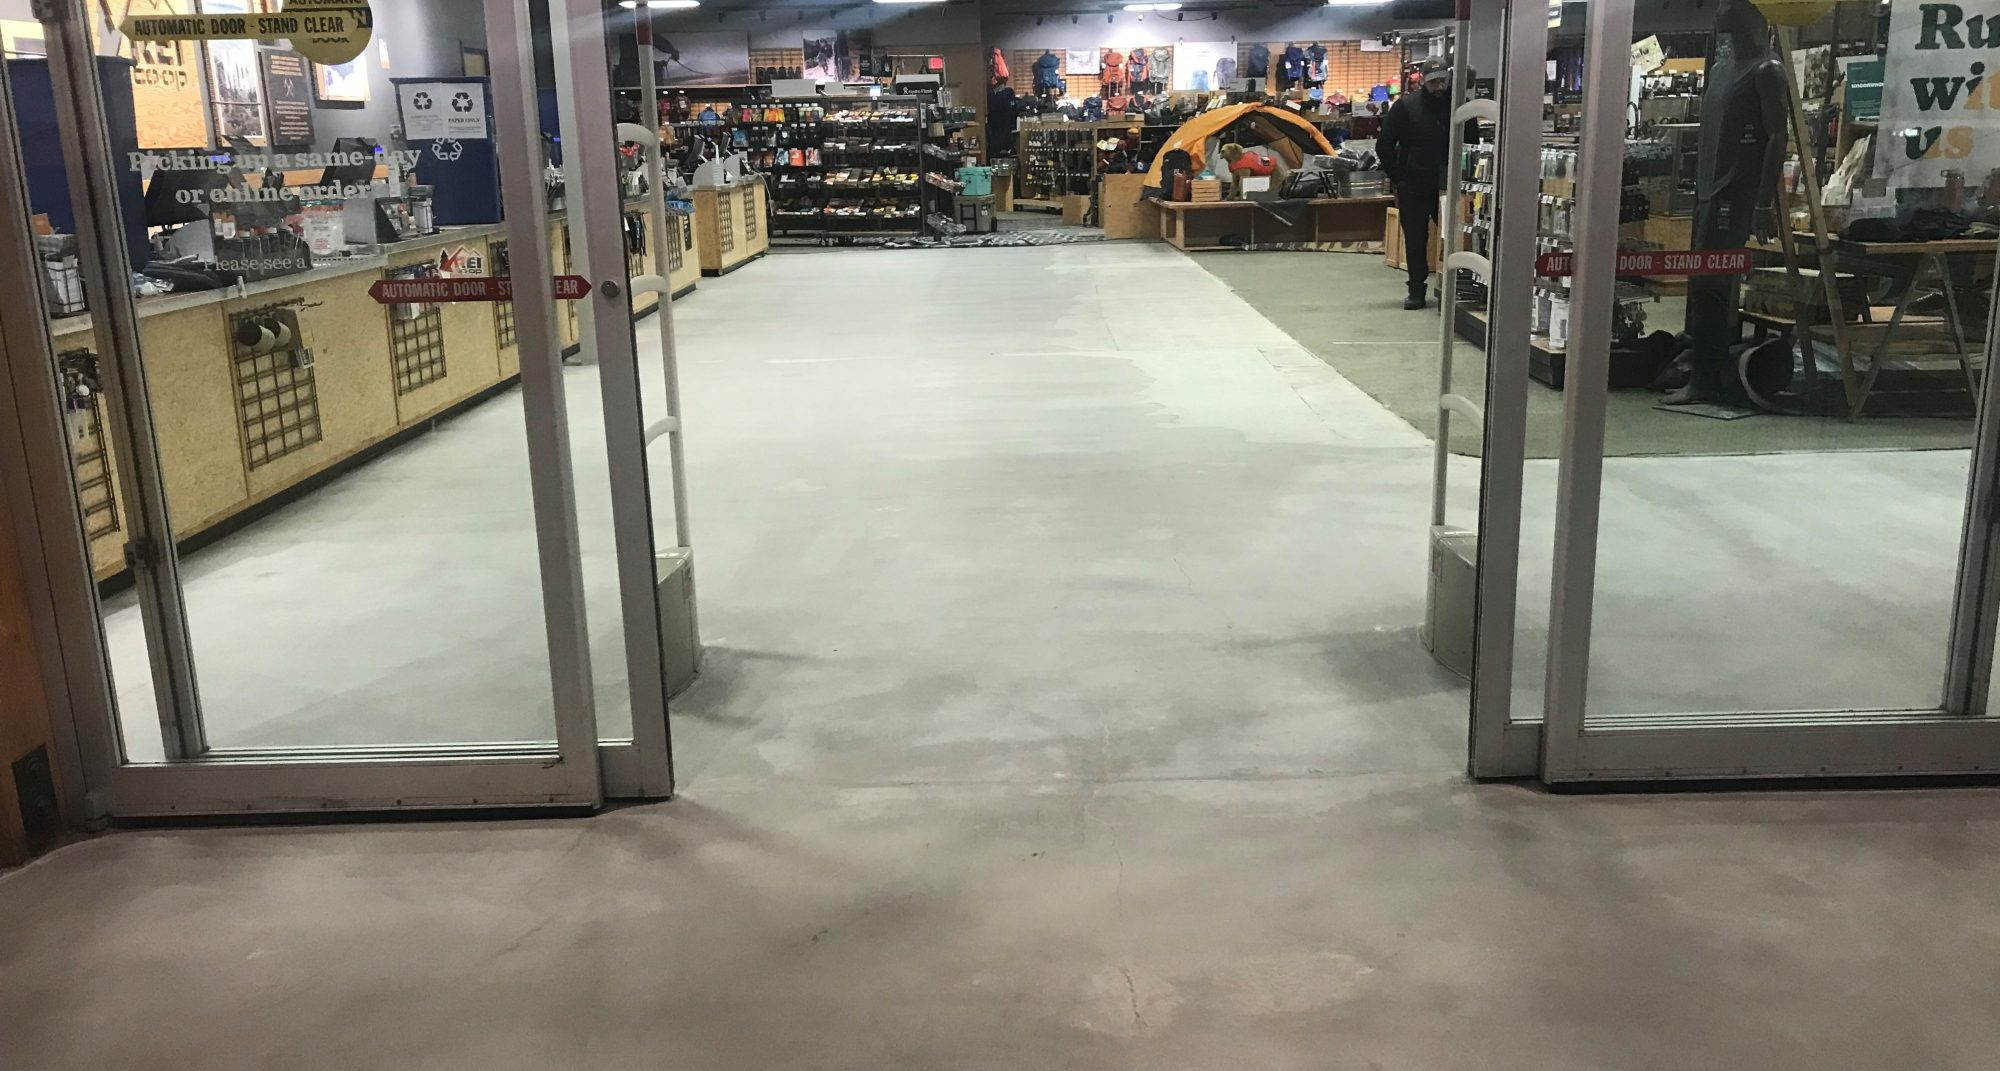 TeamIA, concrete repair, Industrial Applications Inc, commercial concrete polishing, IA30yrs